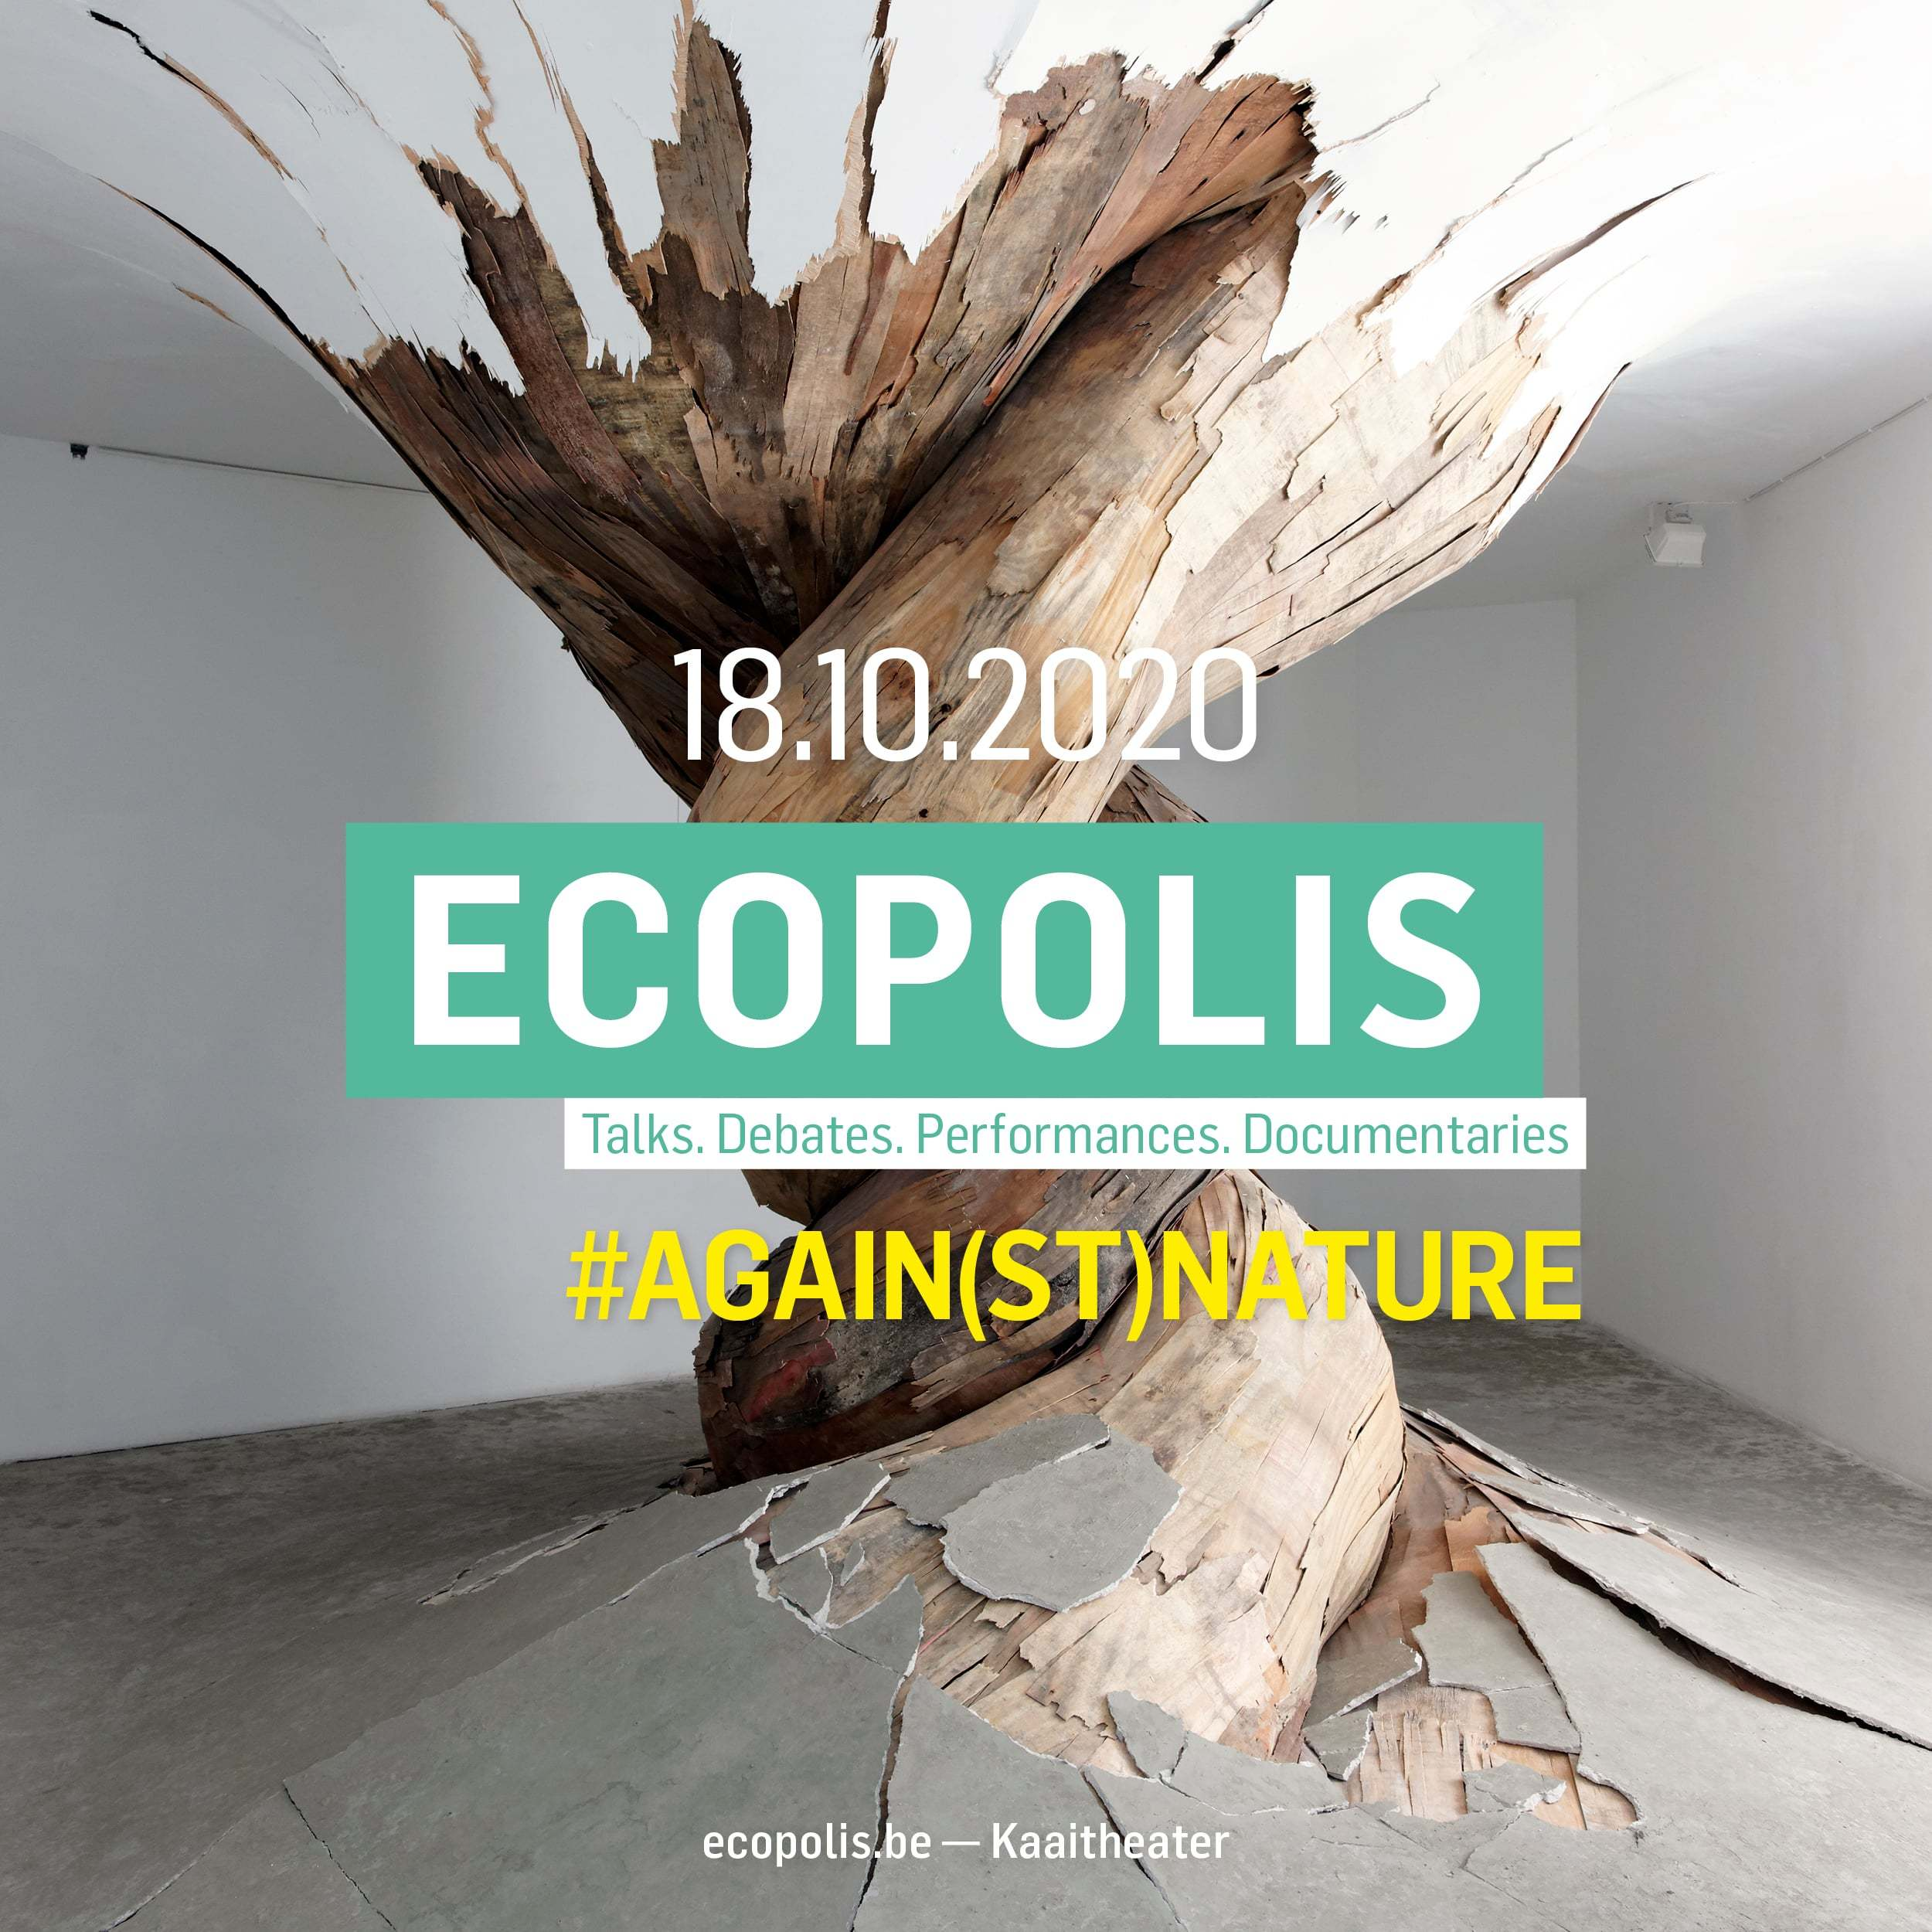 Ecopolis-2020-square-min.jpg#asset:227437